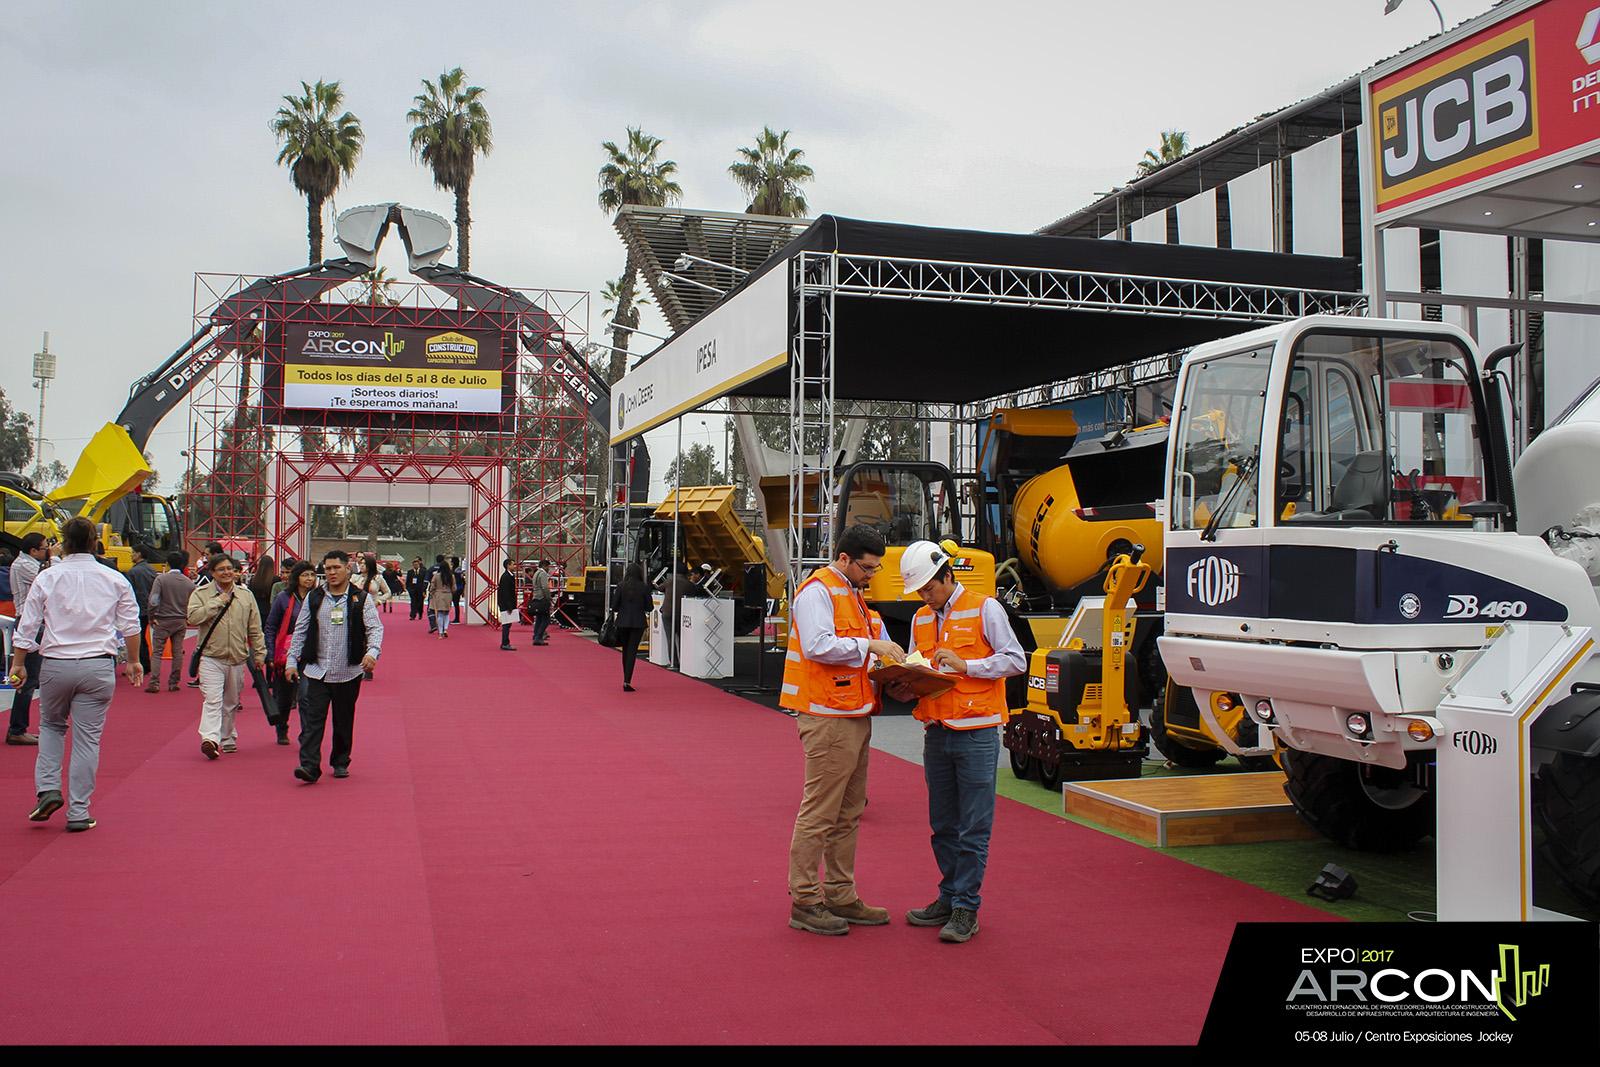 Expo Arcon 2017